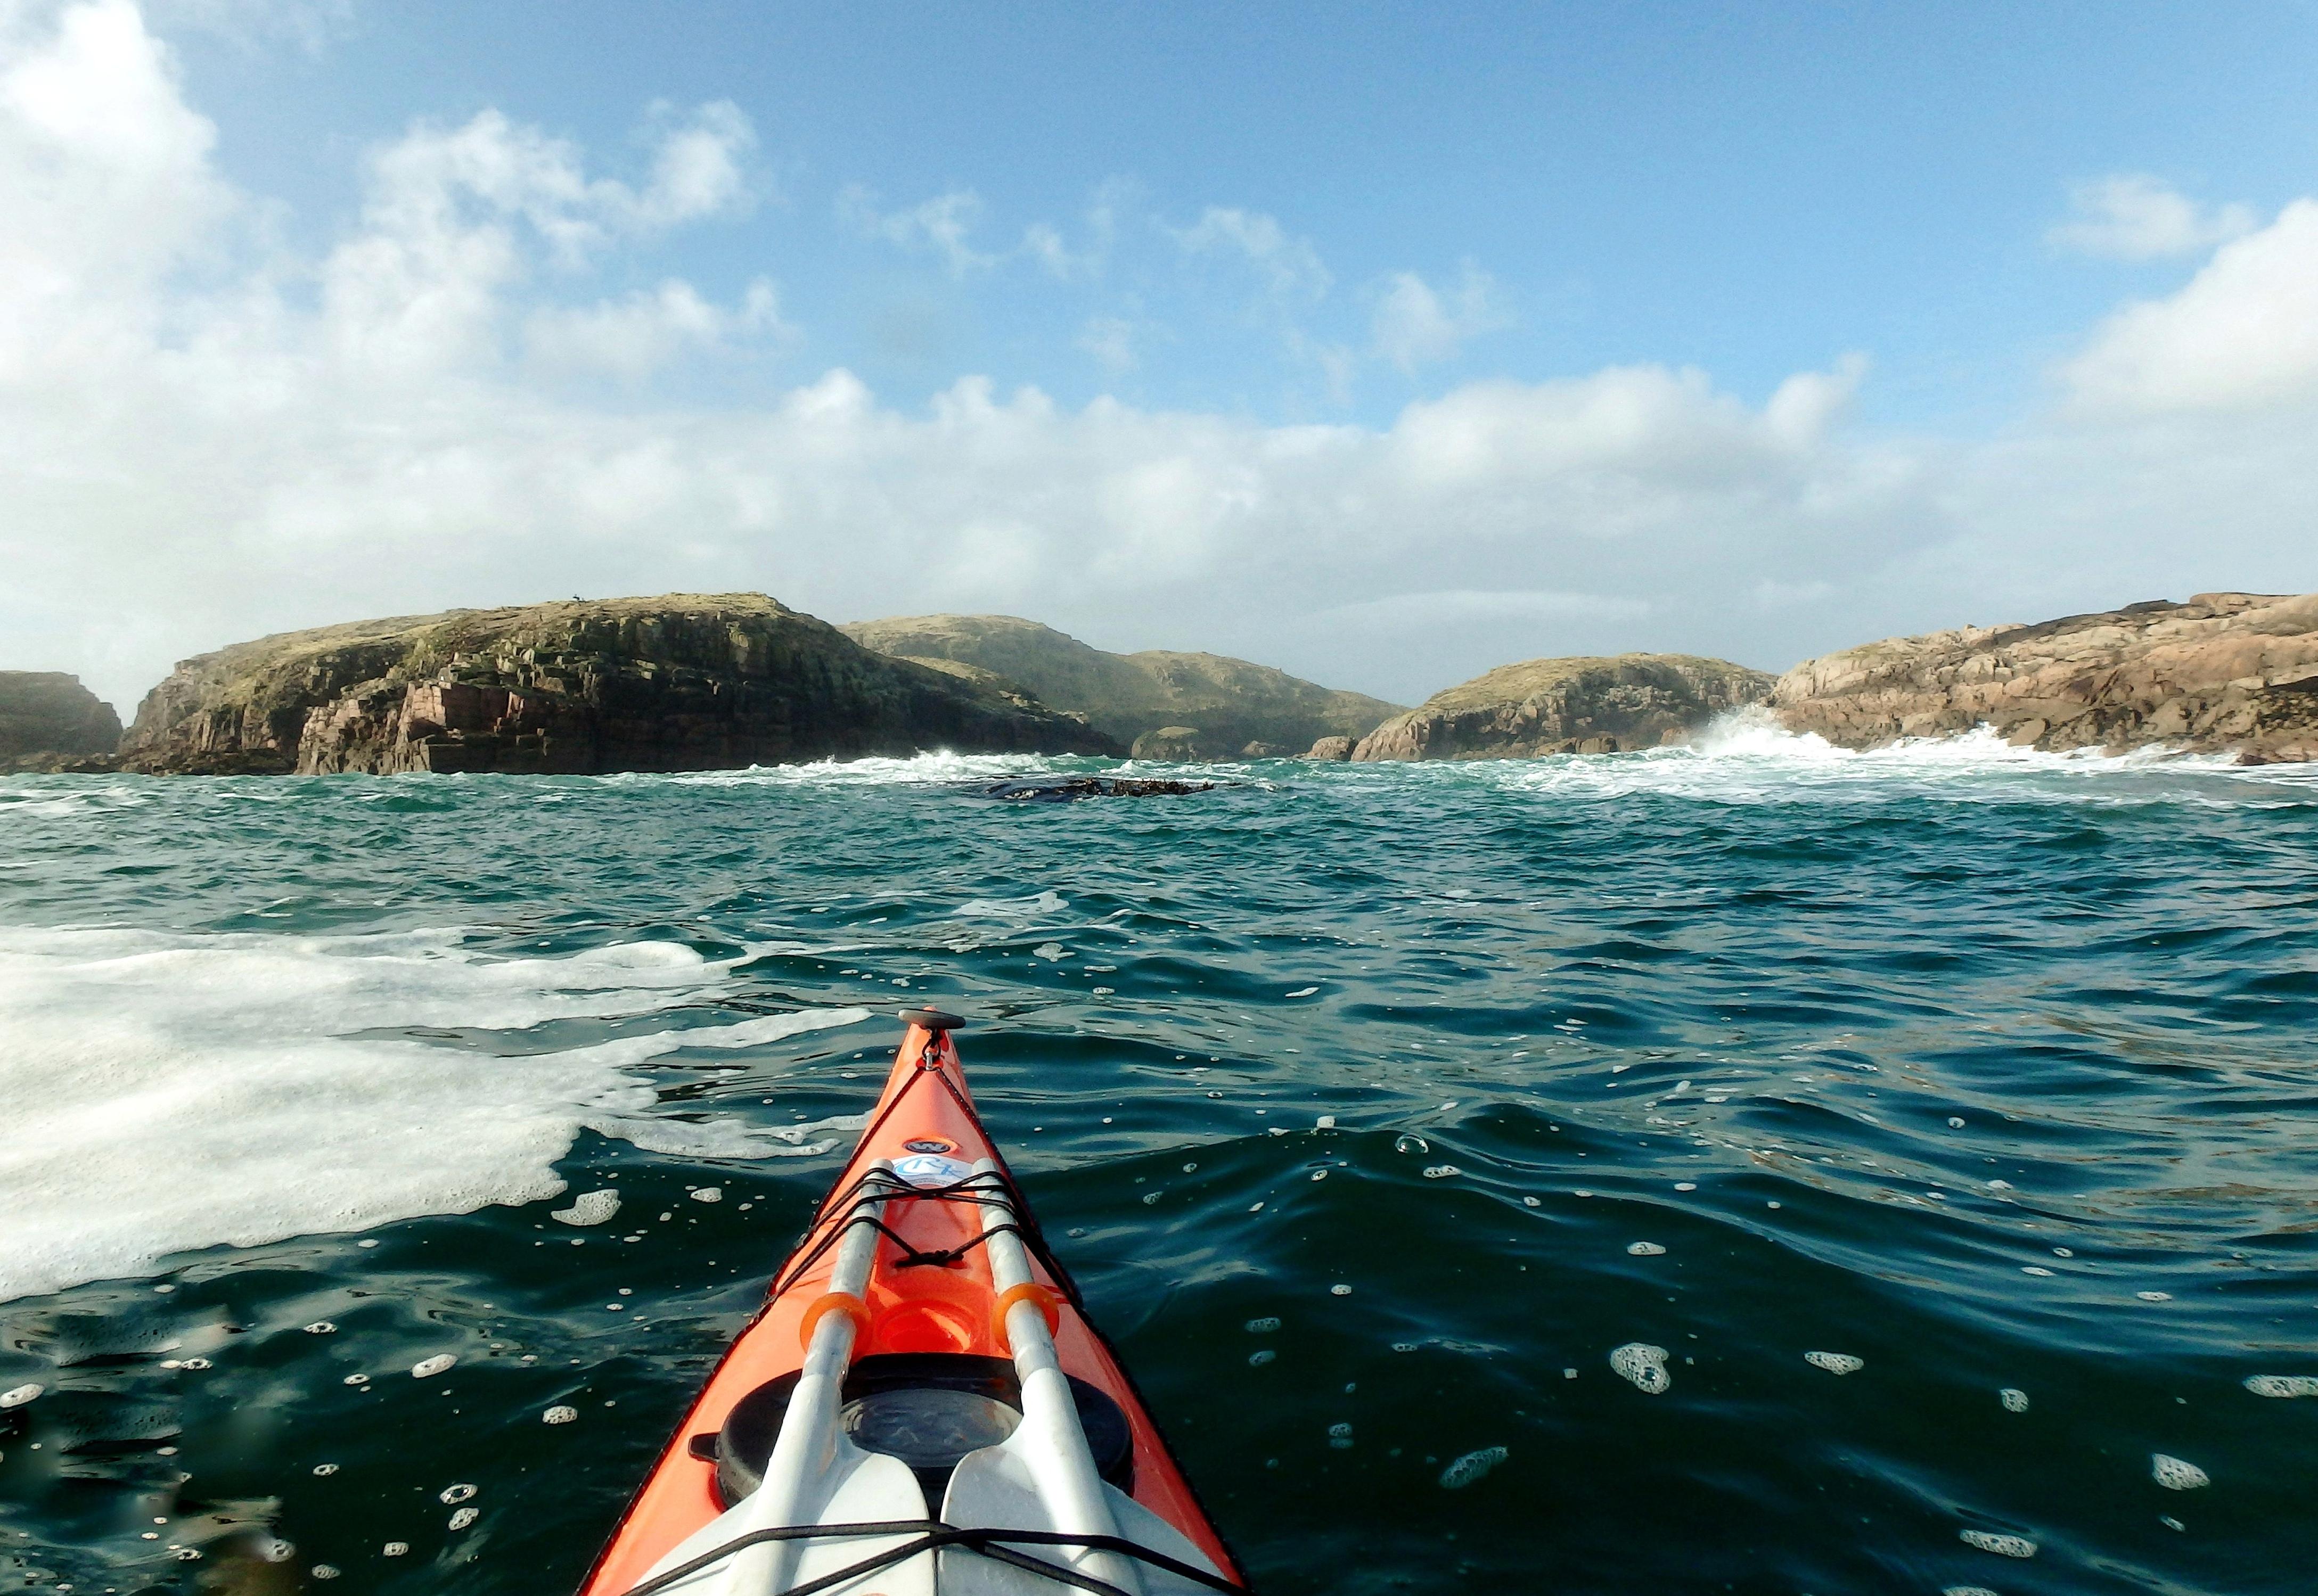 Kayaking in Donegal sea kayaking in Donegal kayaking Gola Island Kayaking Umfin Island